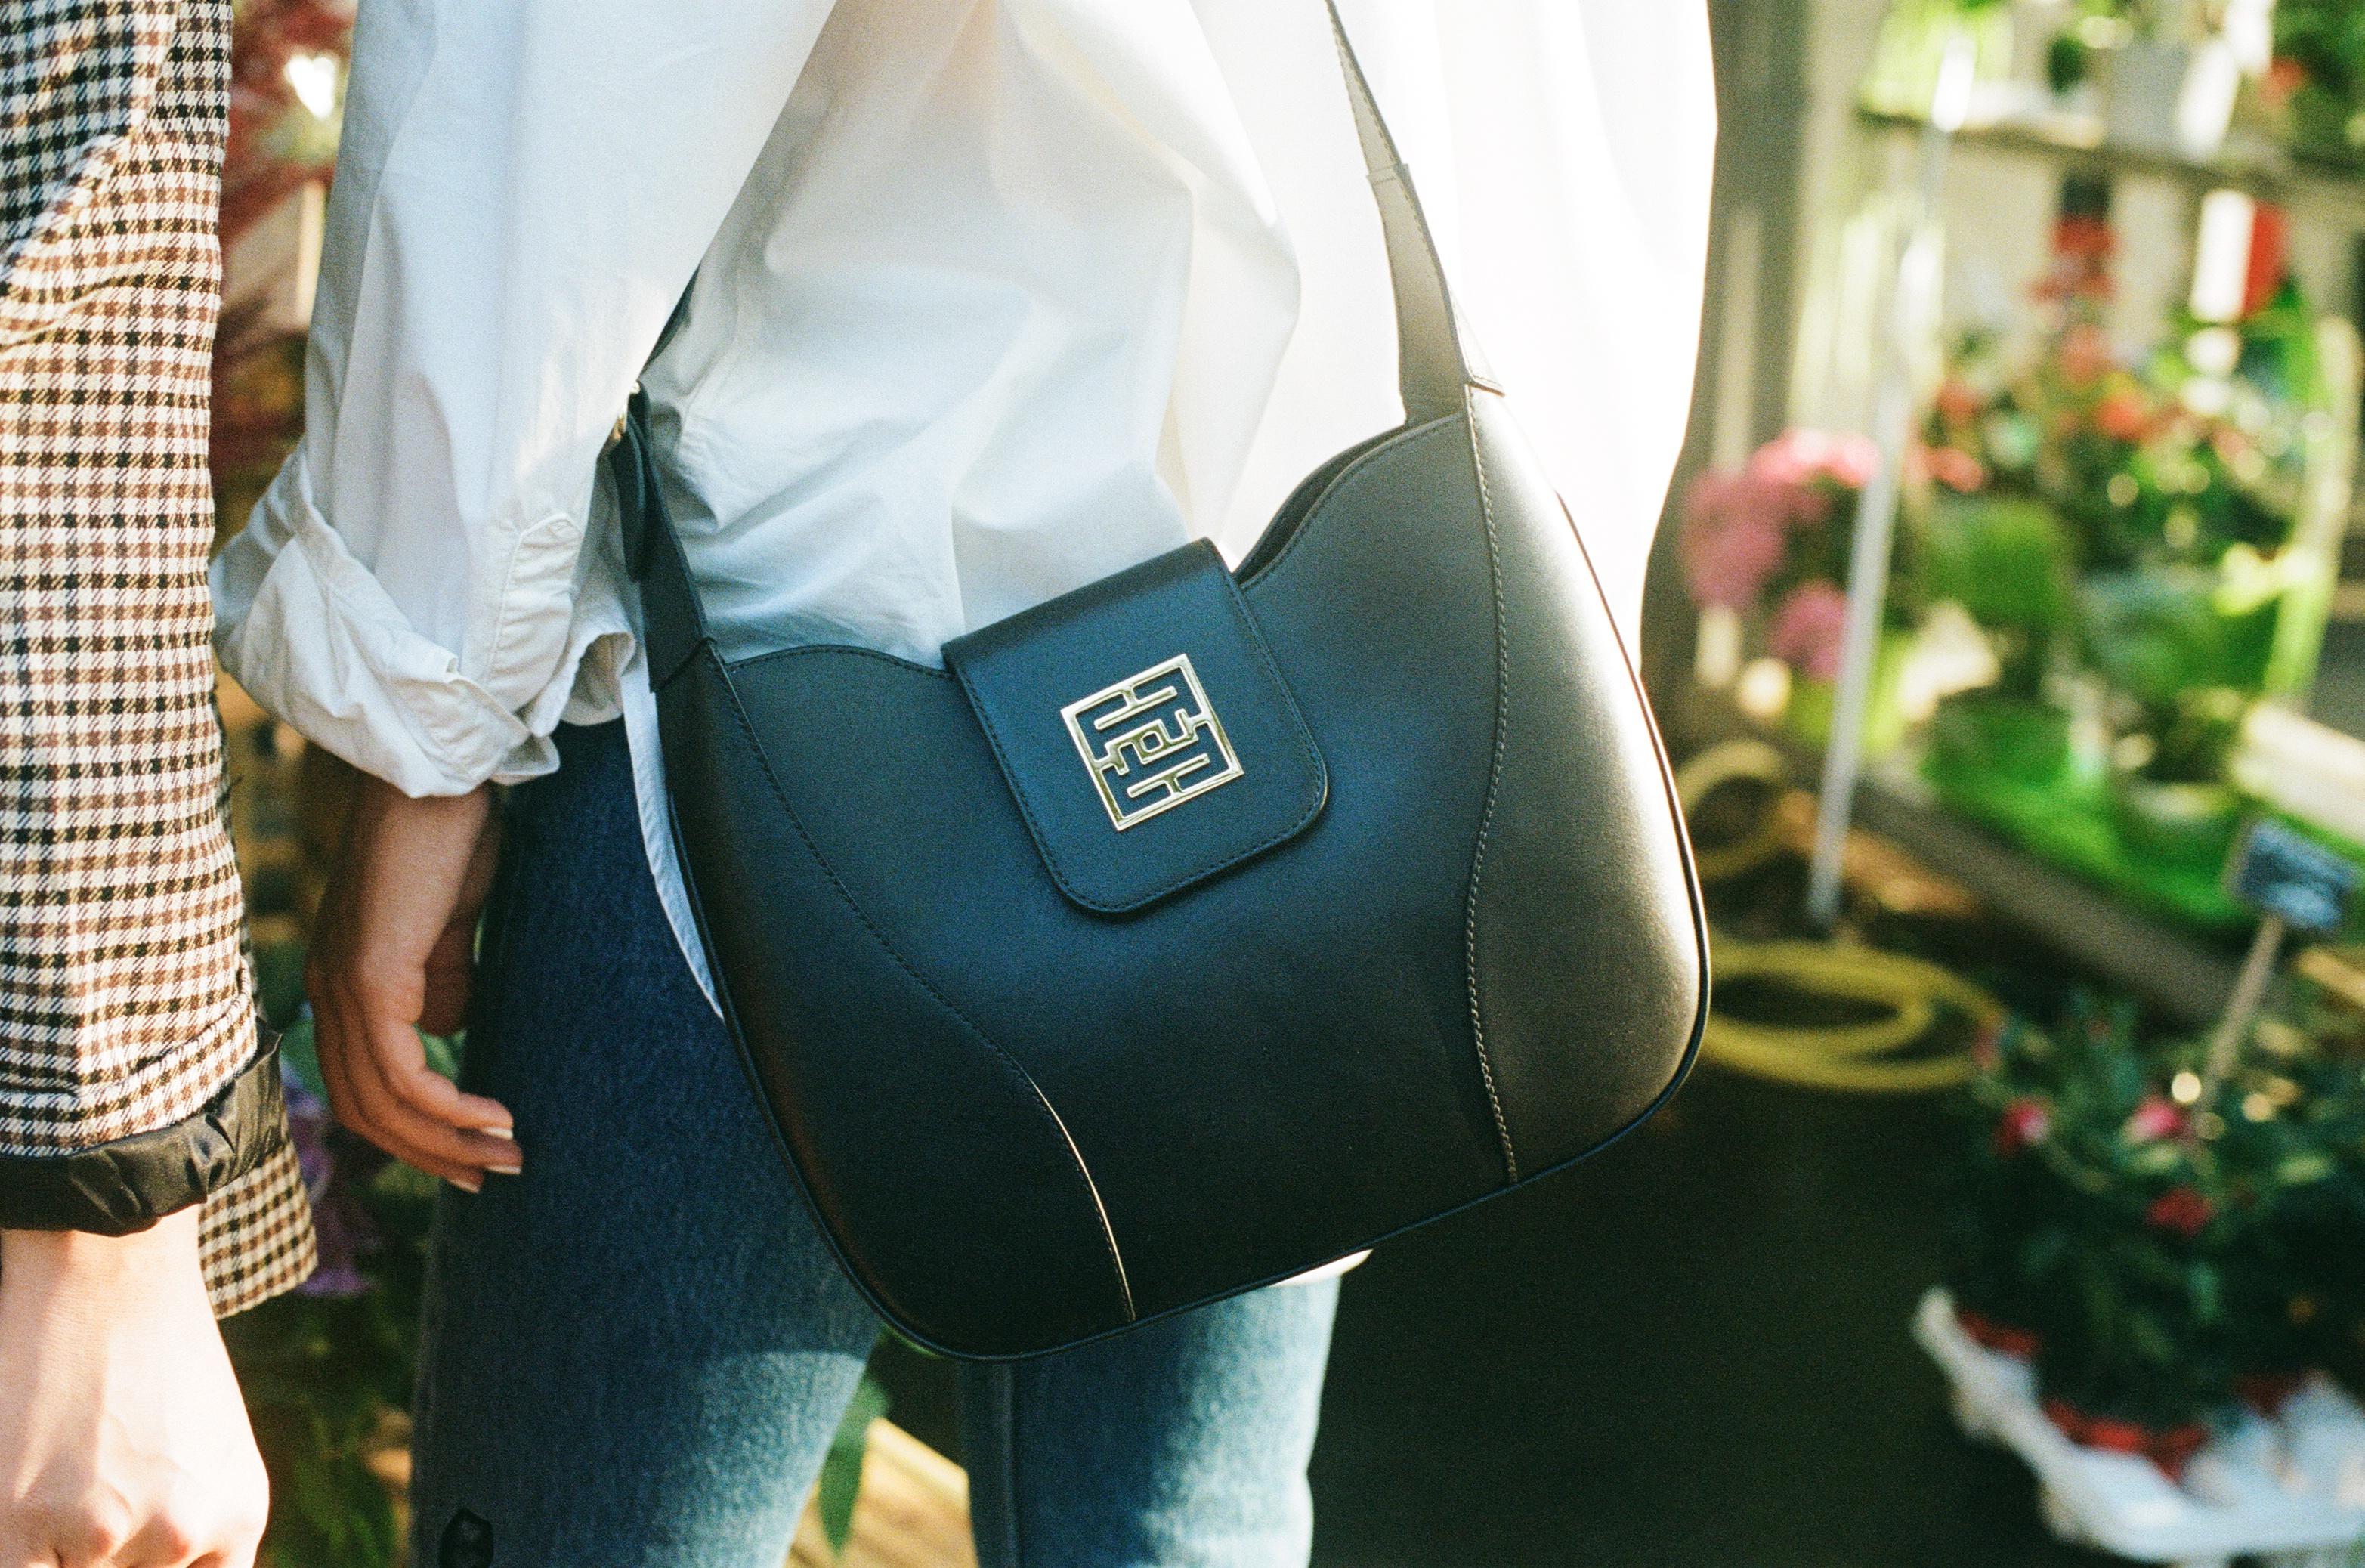 sac noir mat en cuir de vachette